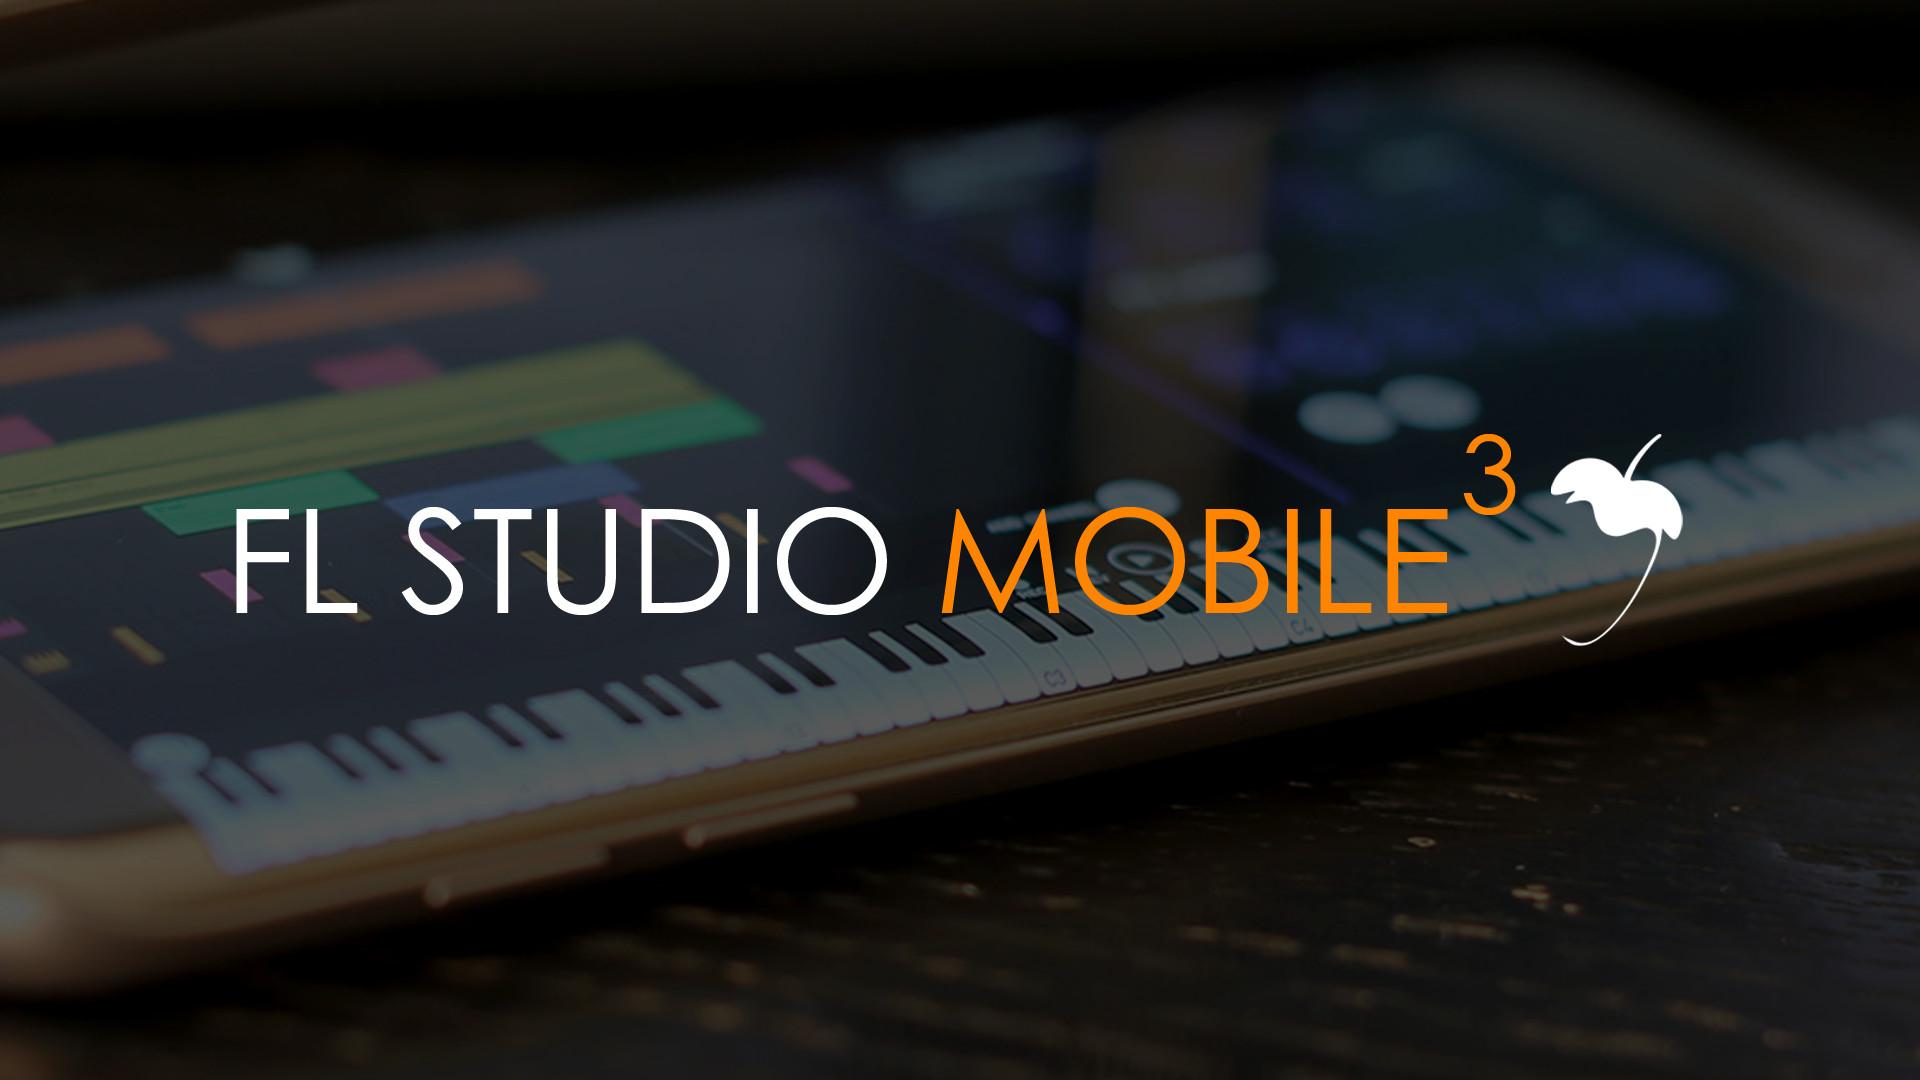 FL Studio Mobile 3 Splash